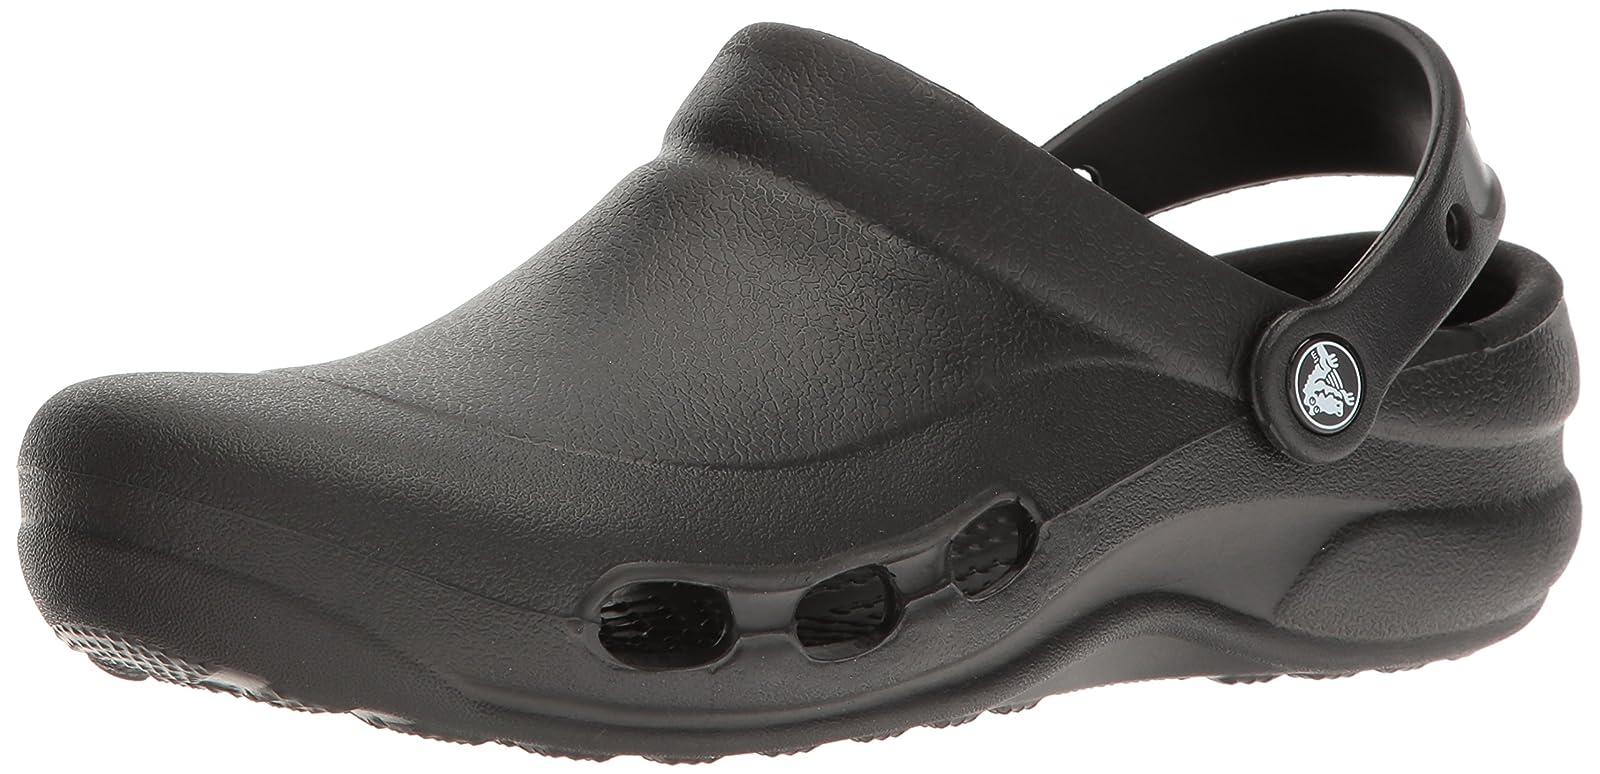 Crocs Unisex Specialist Vent Clog Black 11 10074M Black - 1